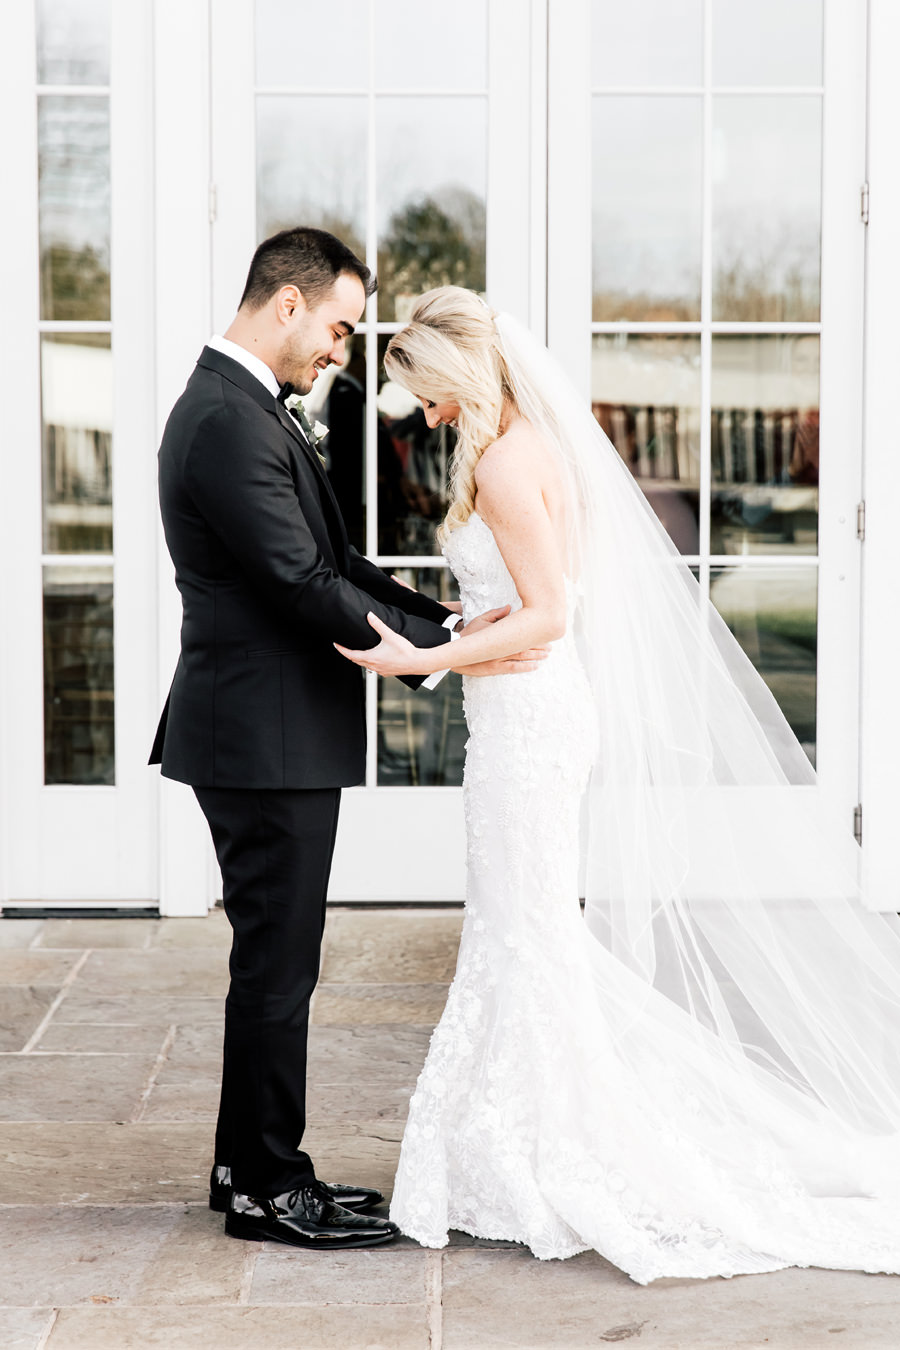 First Look on the Wedding Day - Anastasiia Photography